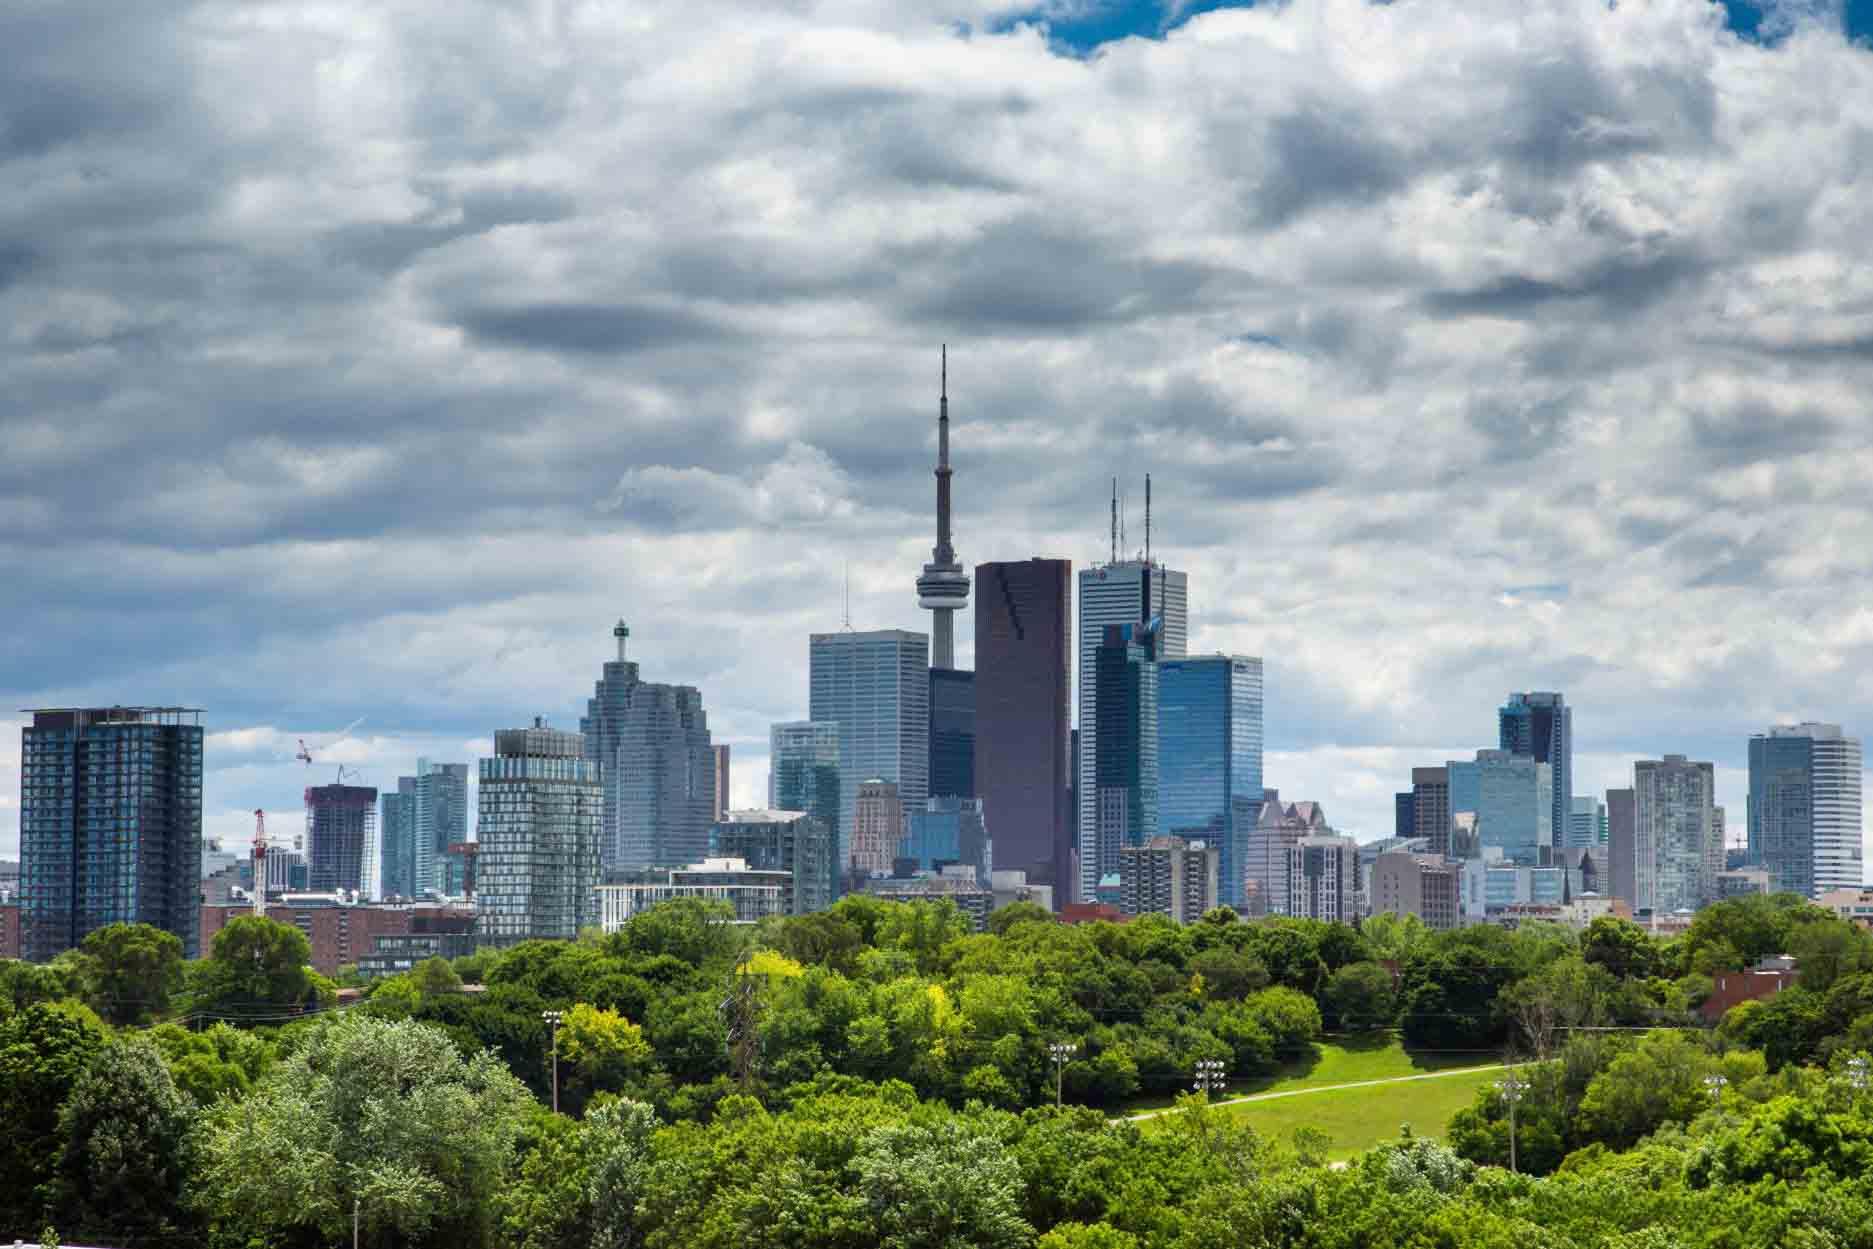 Toronto_skyline_from_Riverdale_Park_June_25_2012